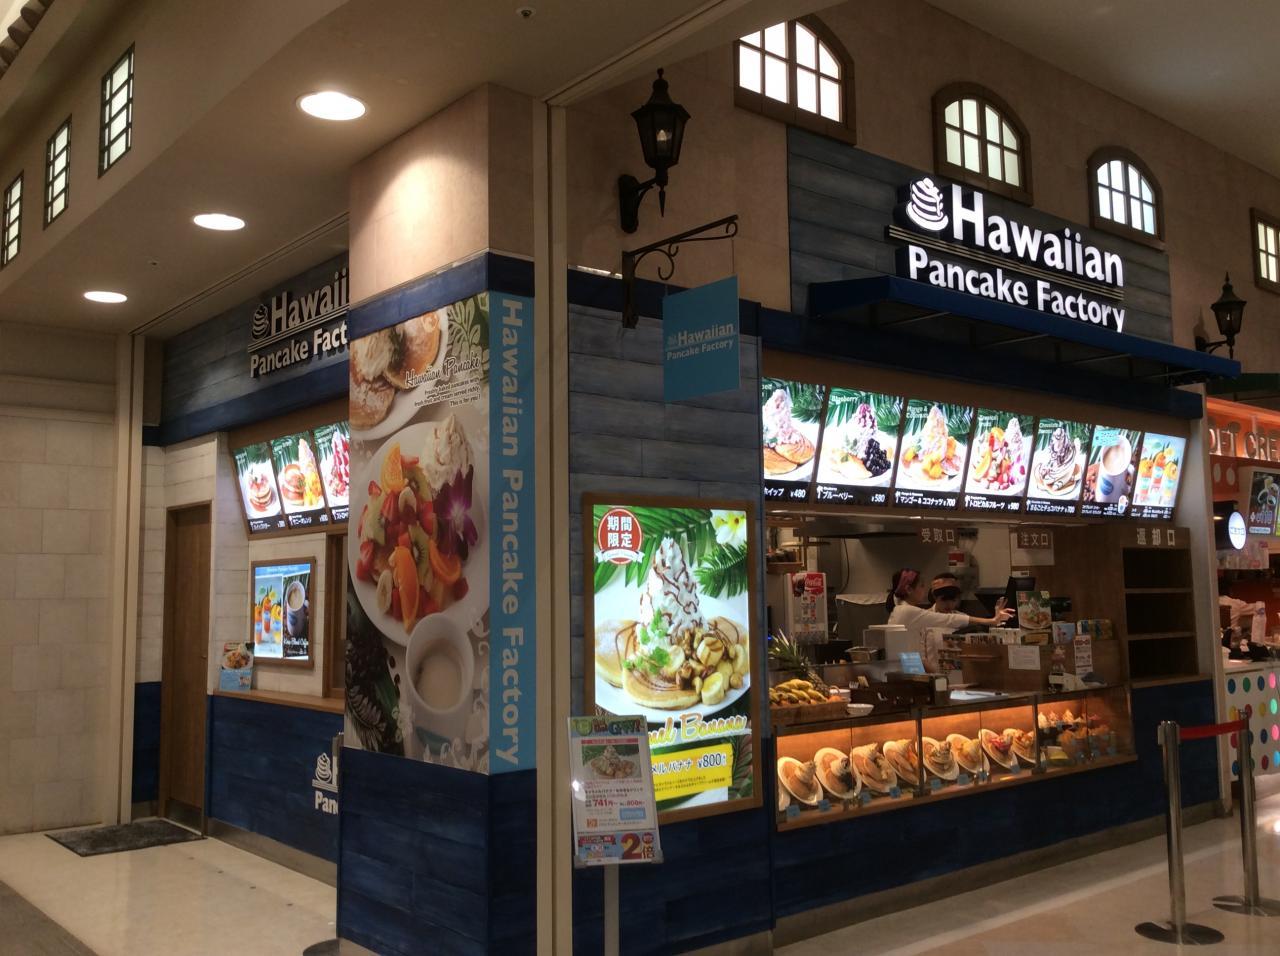 HawaiianPancakeFactoryイオンモール北戸田店(店舗外観)